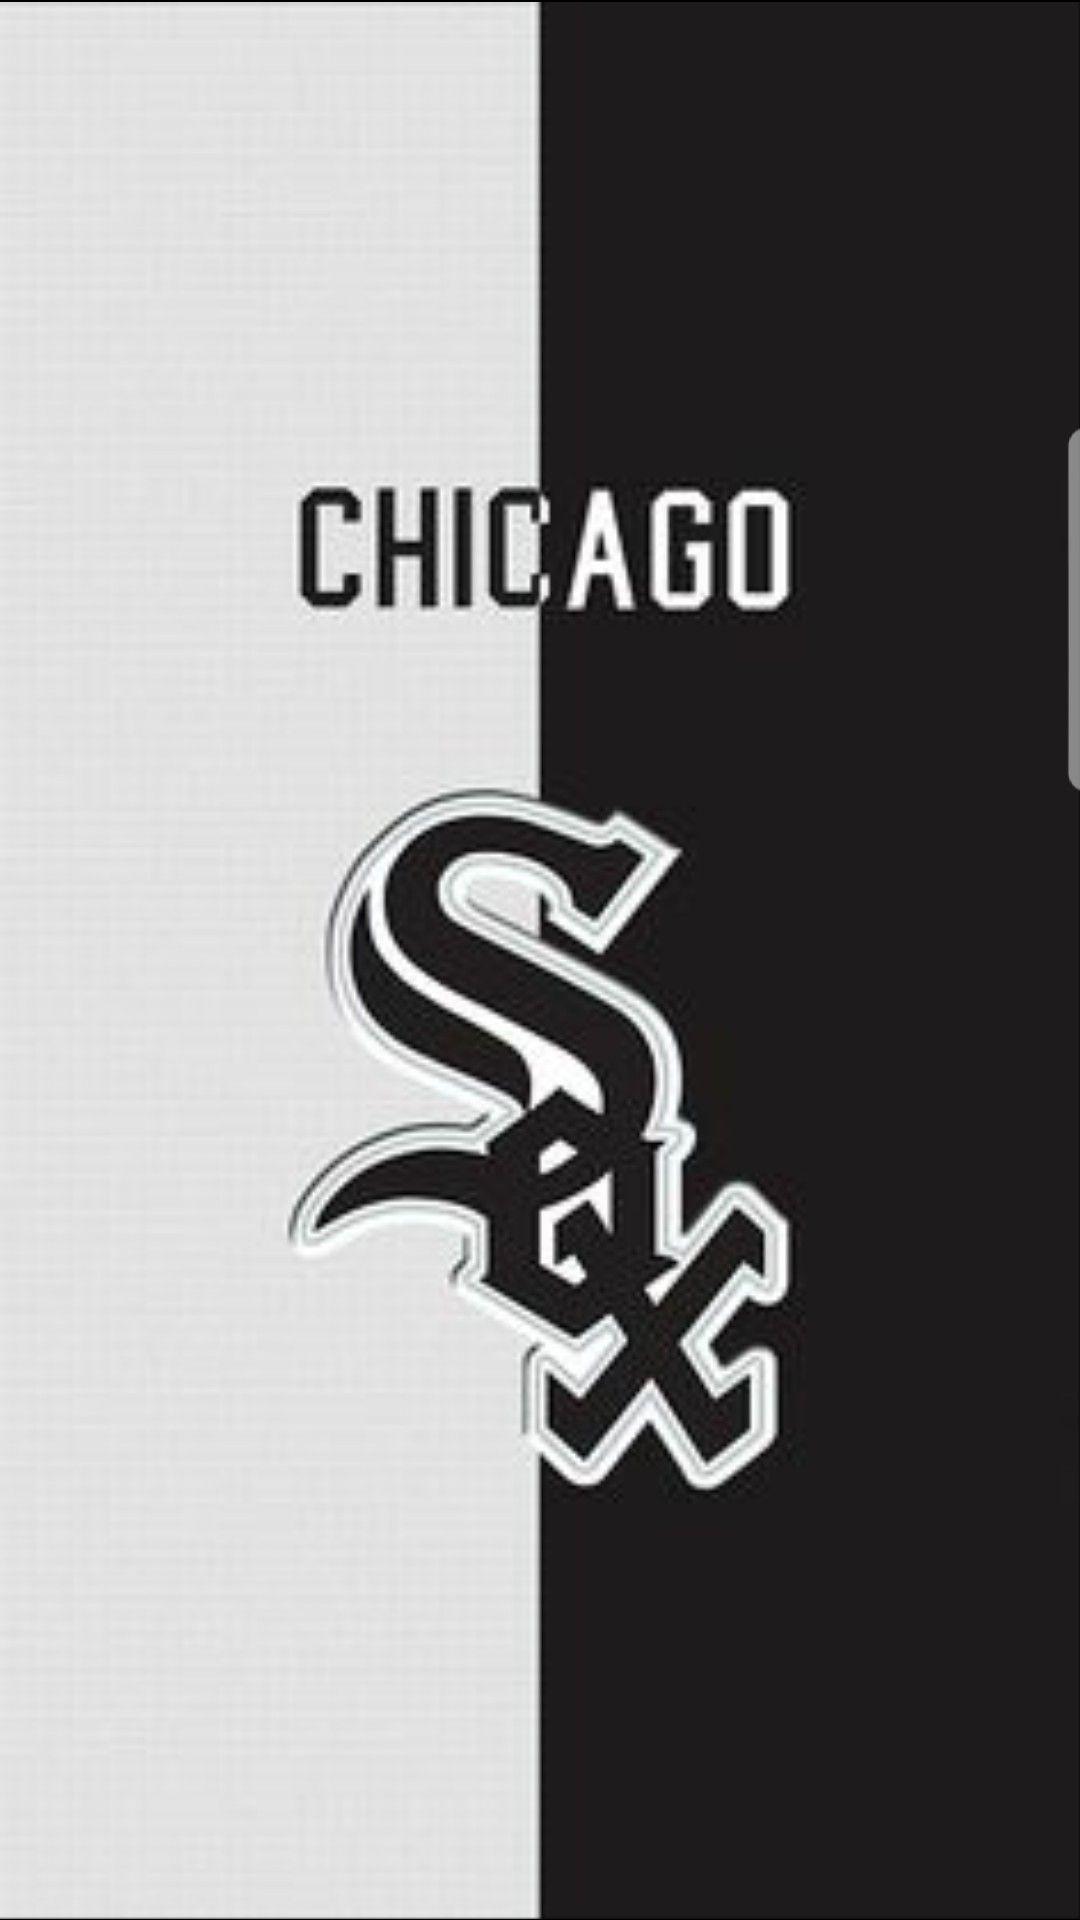 Pin By Archie Douglas On Sportz Wallpaperz Chicago White Sox White Sox Logo Chicago